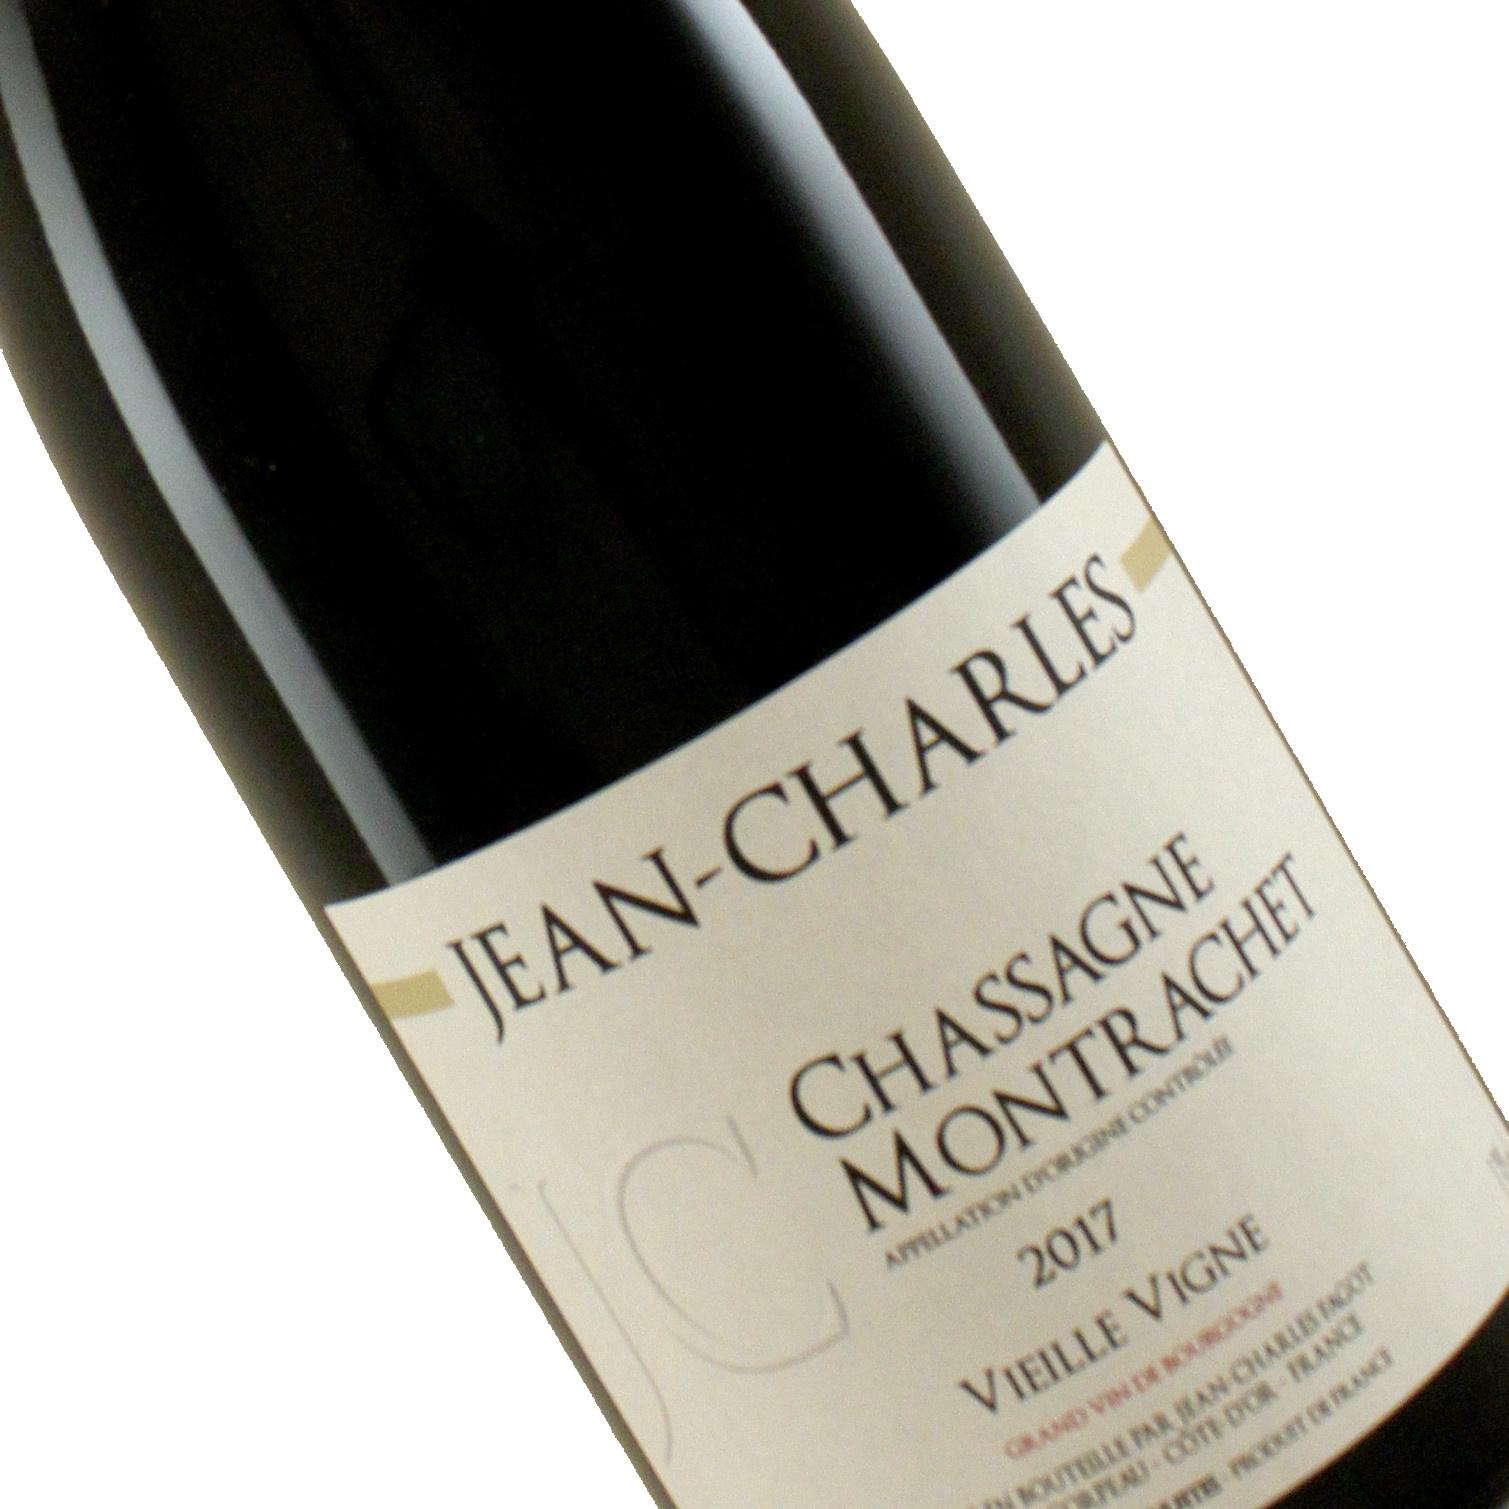 Jean-Charles 2017 Chassagne Montrachet Rouge, Burgundy